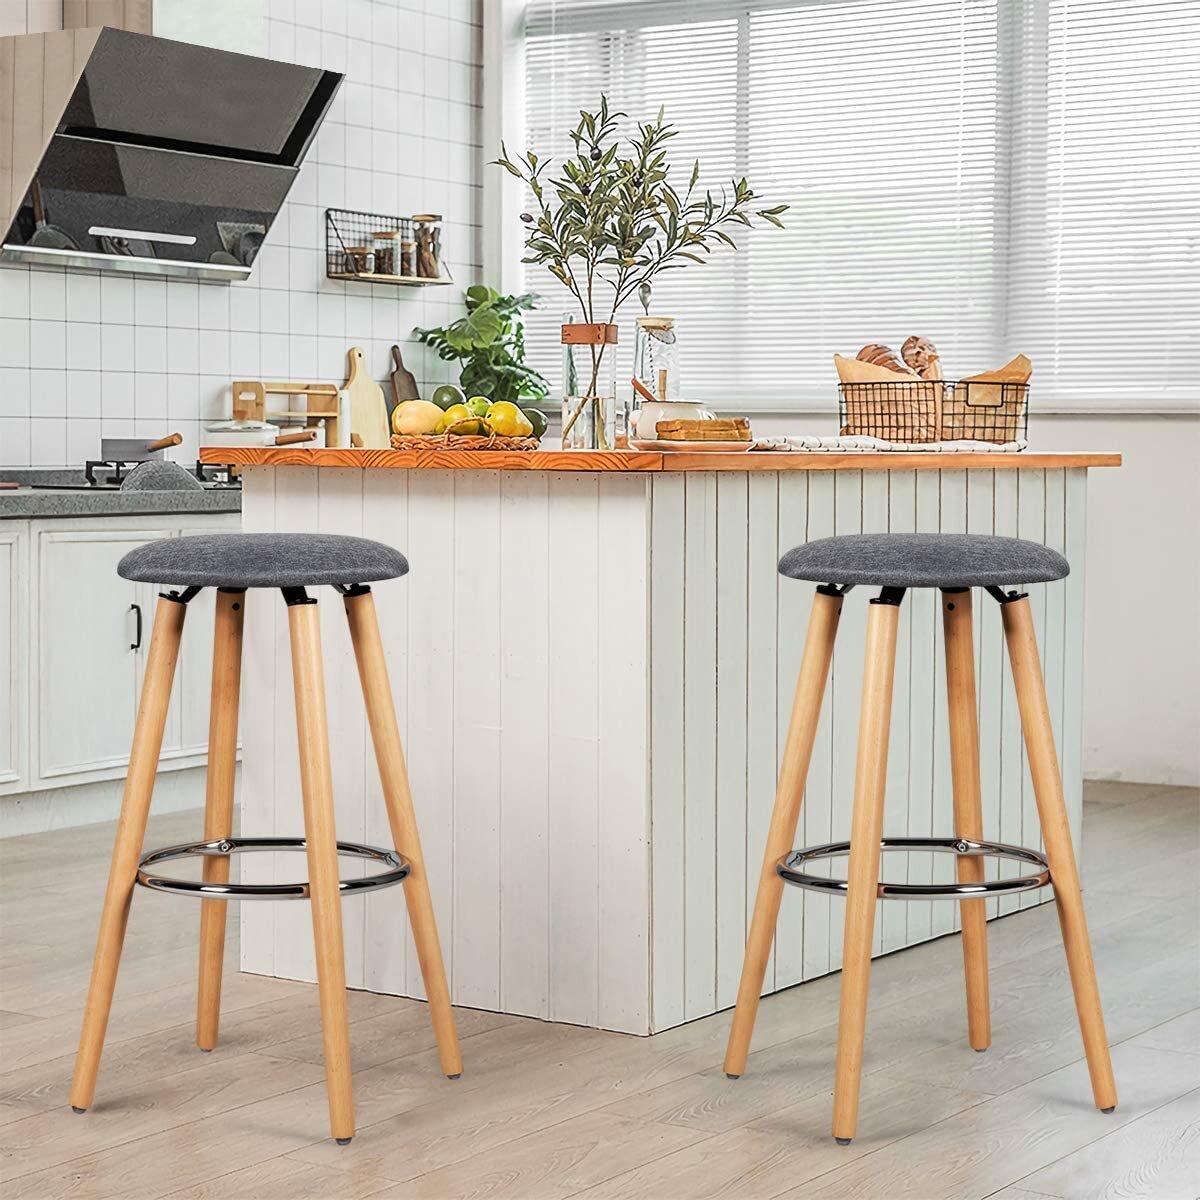 Norden Home Set of 9 bar stool counter stool round stool seat stool kitchen  stool